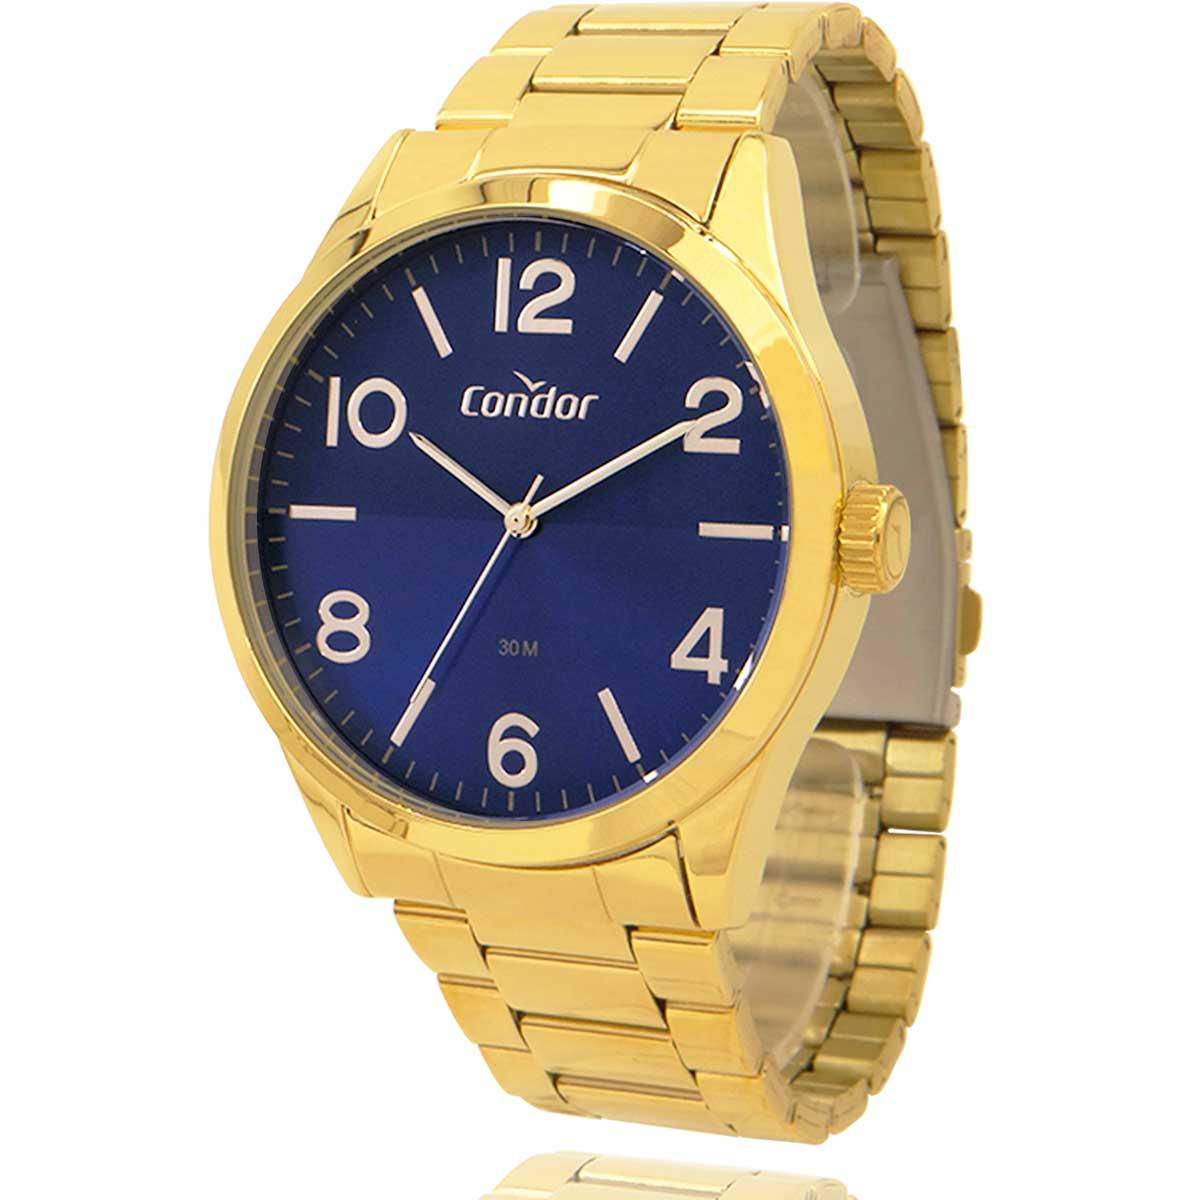 Relógio Condor Masculino Dourado e Azul COPC21AEDWK4A com Carteira Lebrave e Pulseira de Brinde